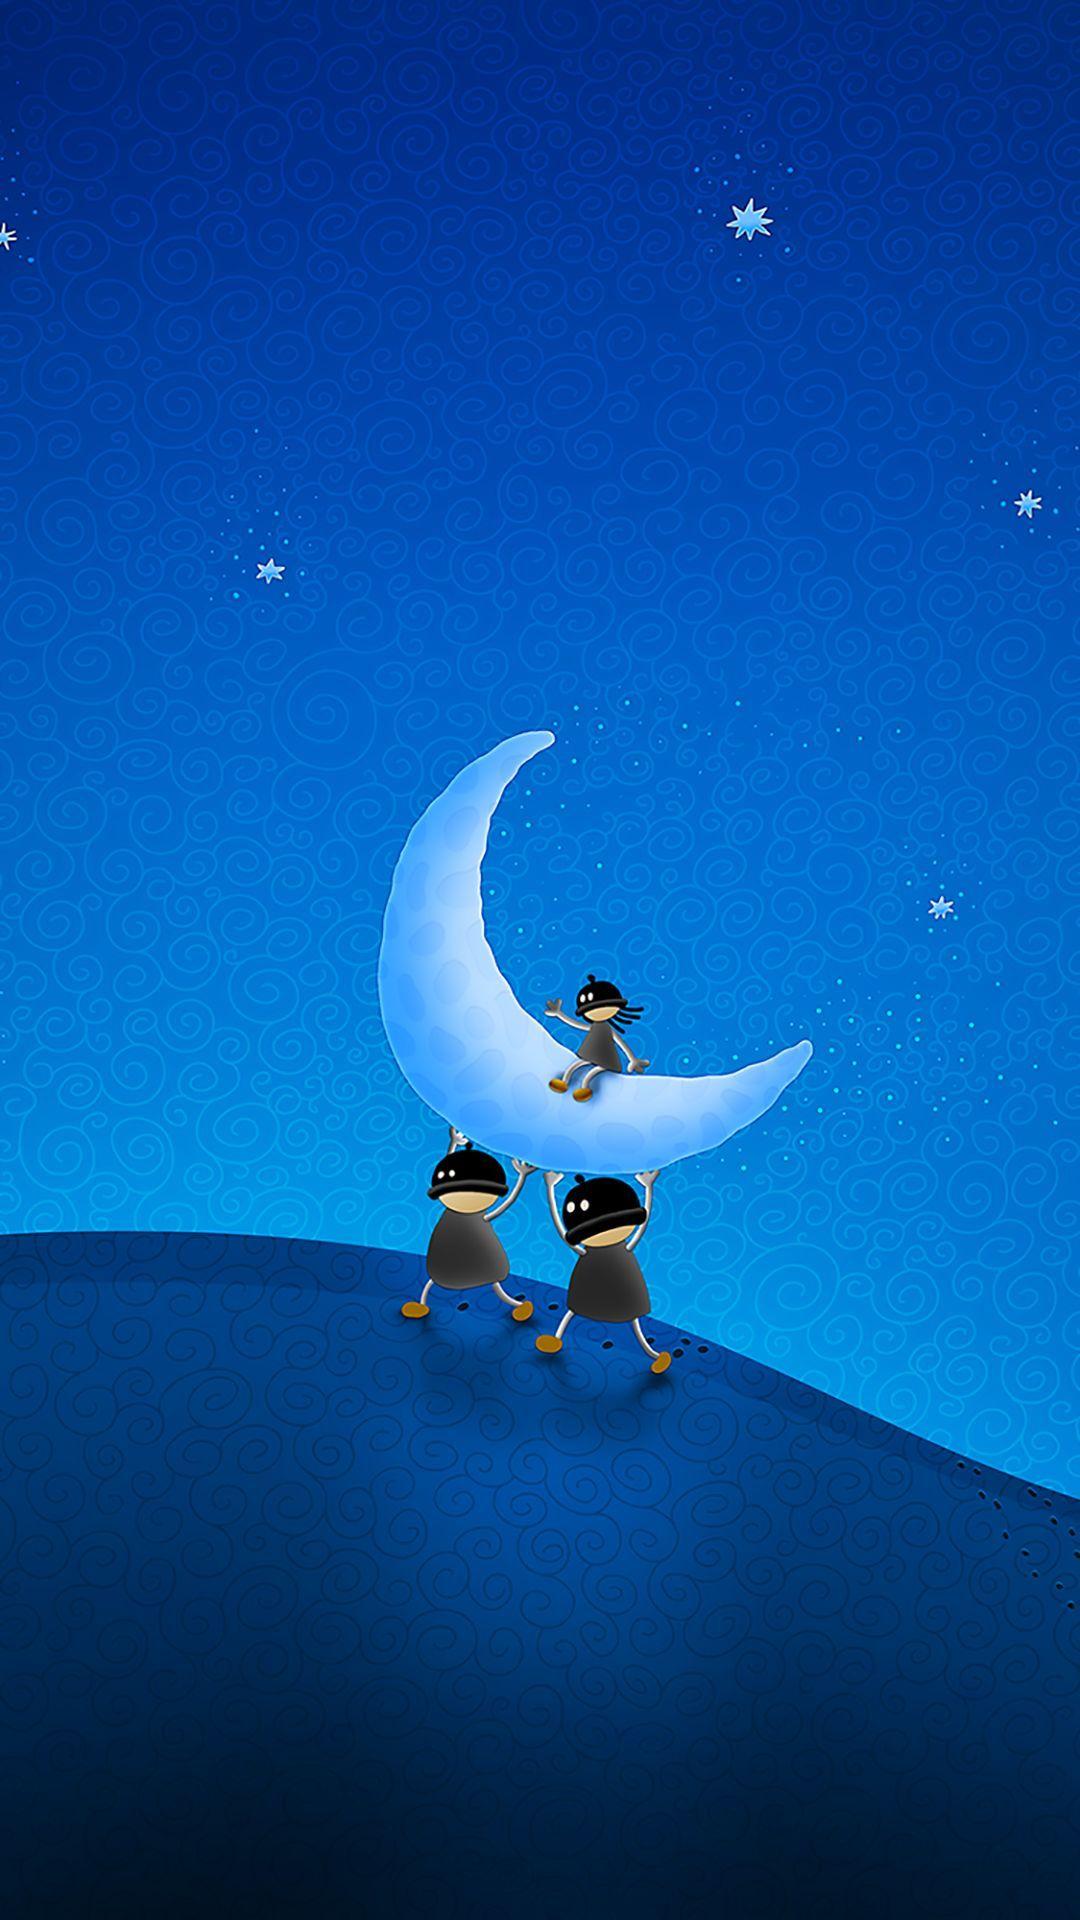 Tap And Get The Free App Art Creative Moon Sky Stars Fun Blue